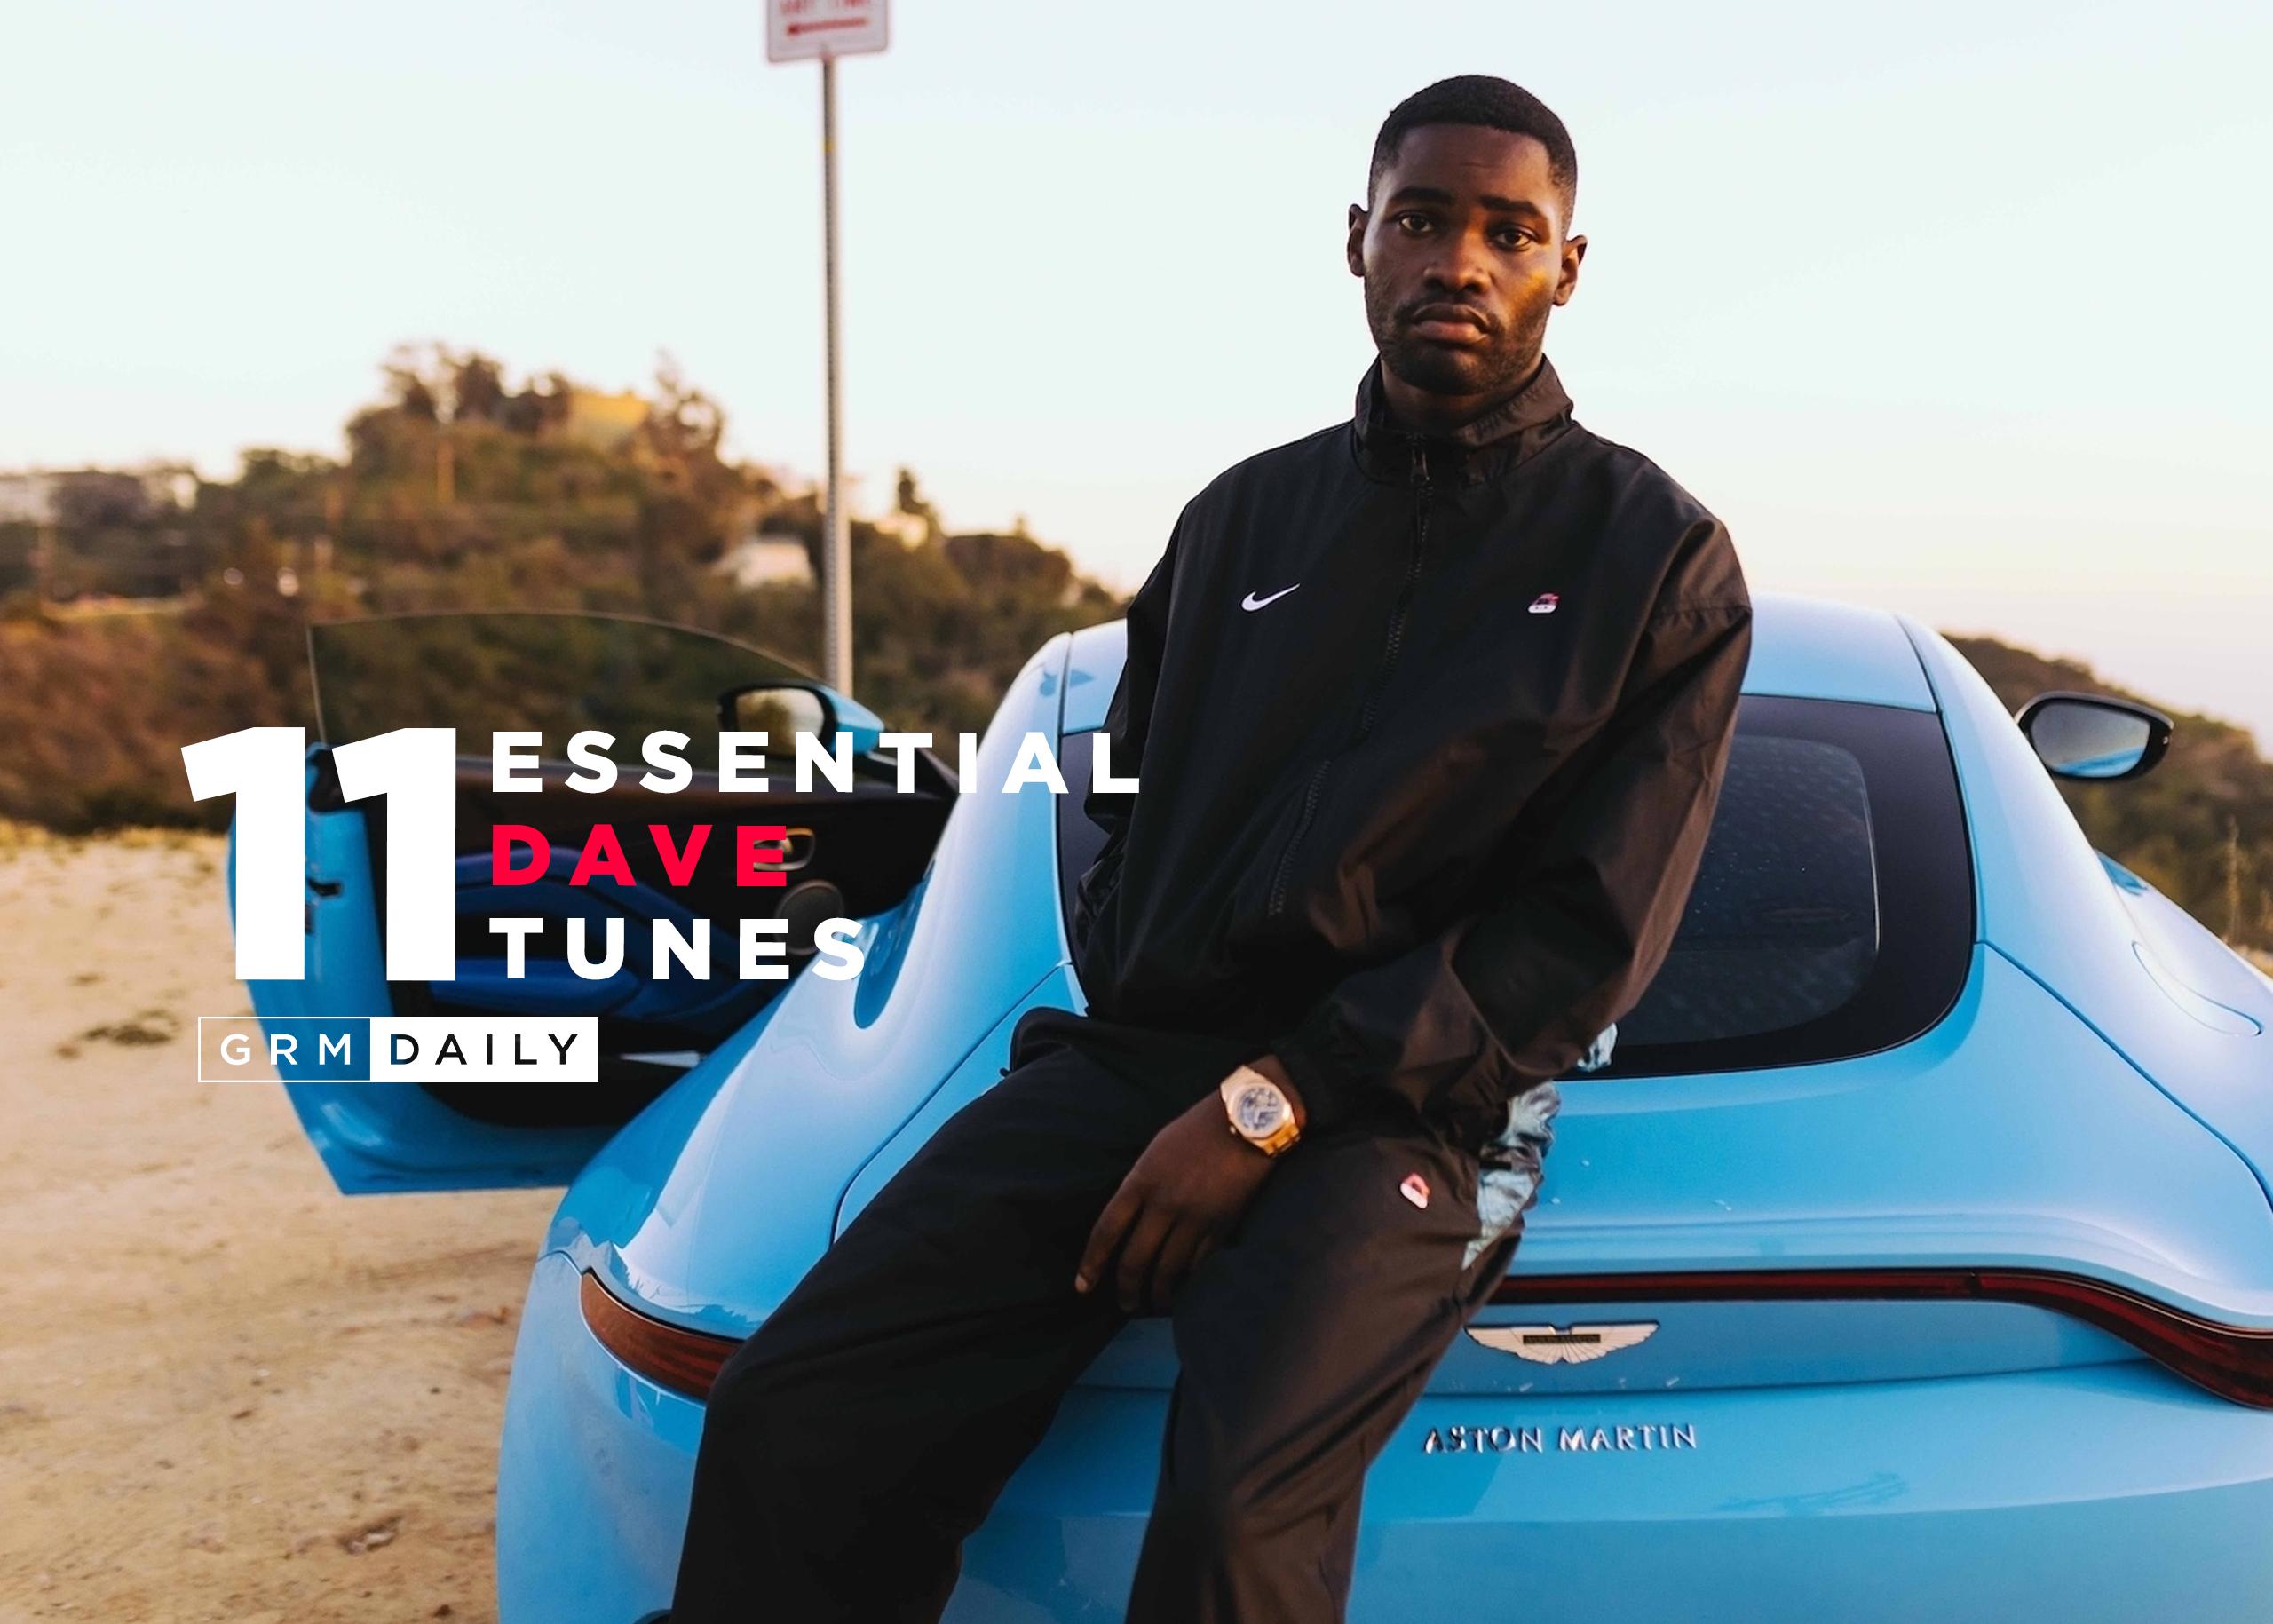 Dave Essentials